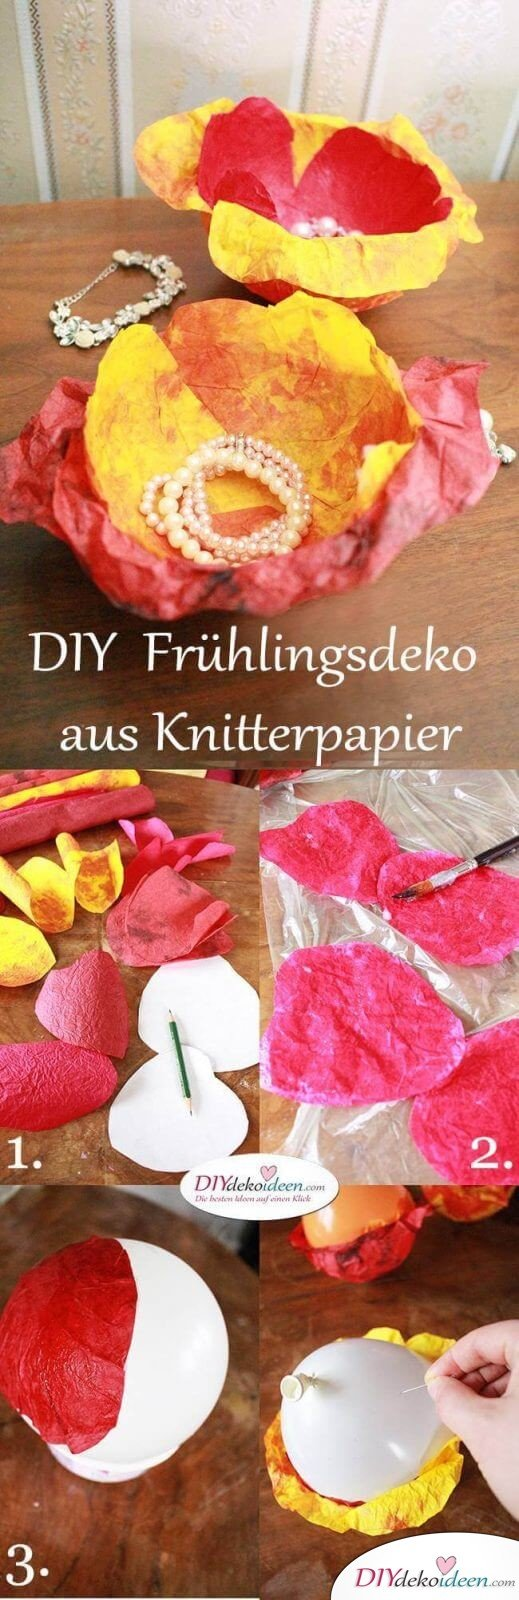 DIY Dekoidee - Frühlingsdeko basteln aus Knitterpapier